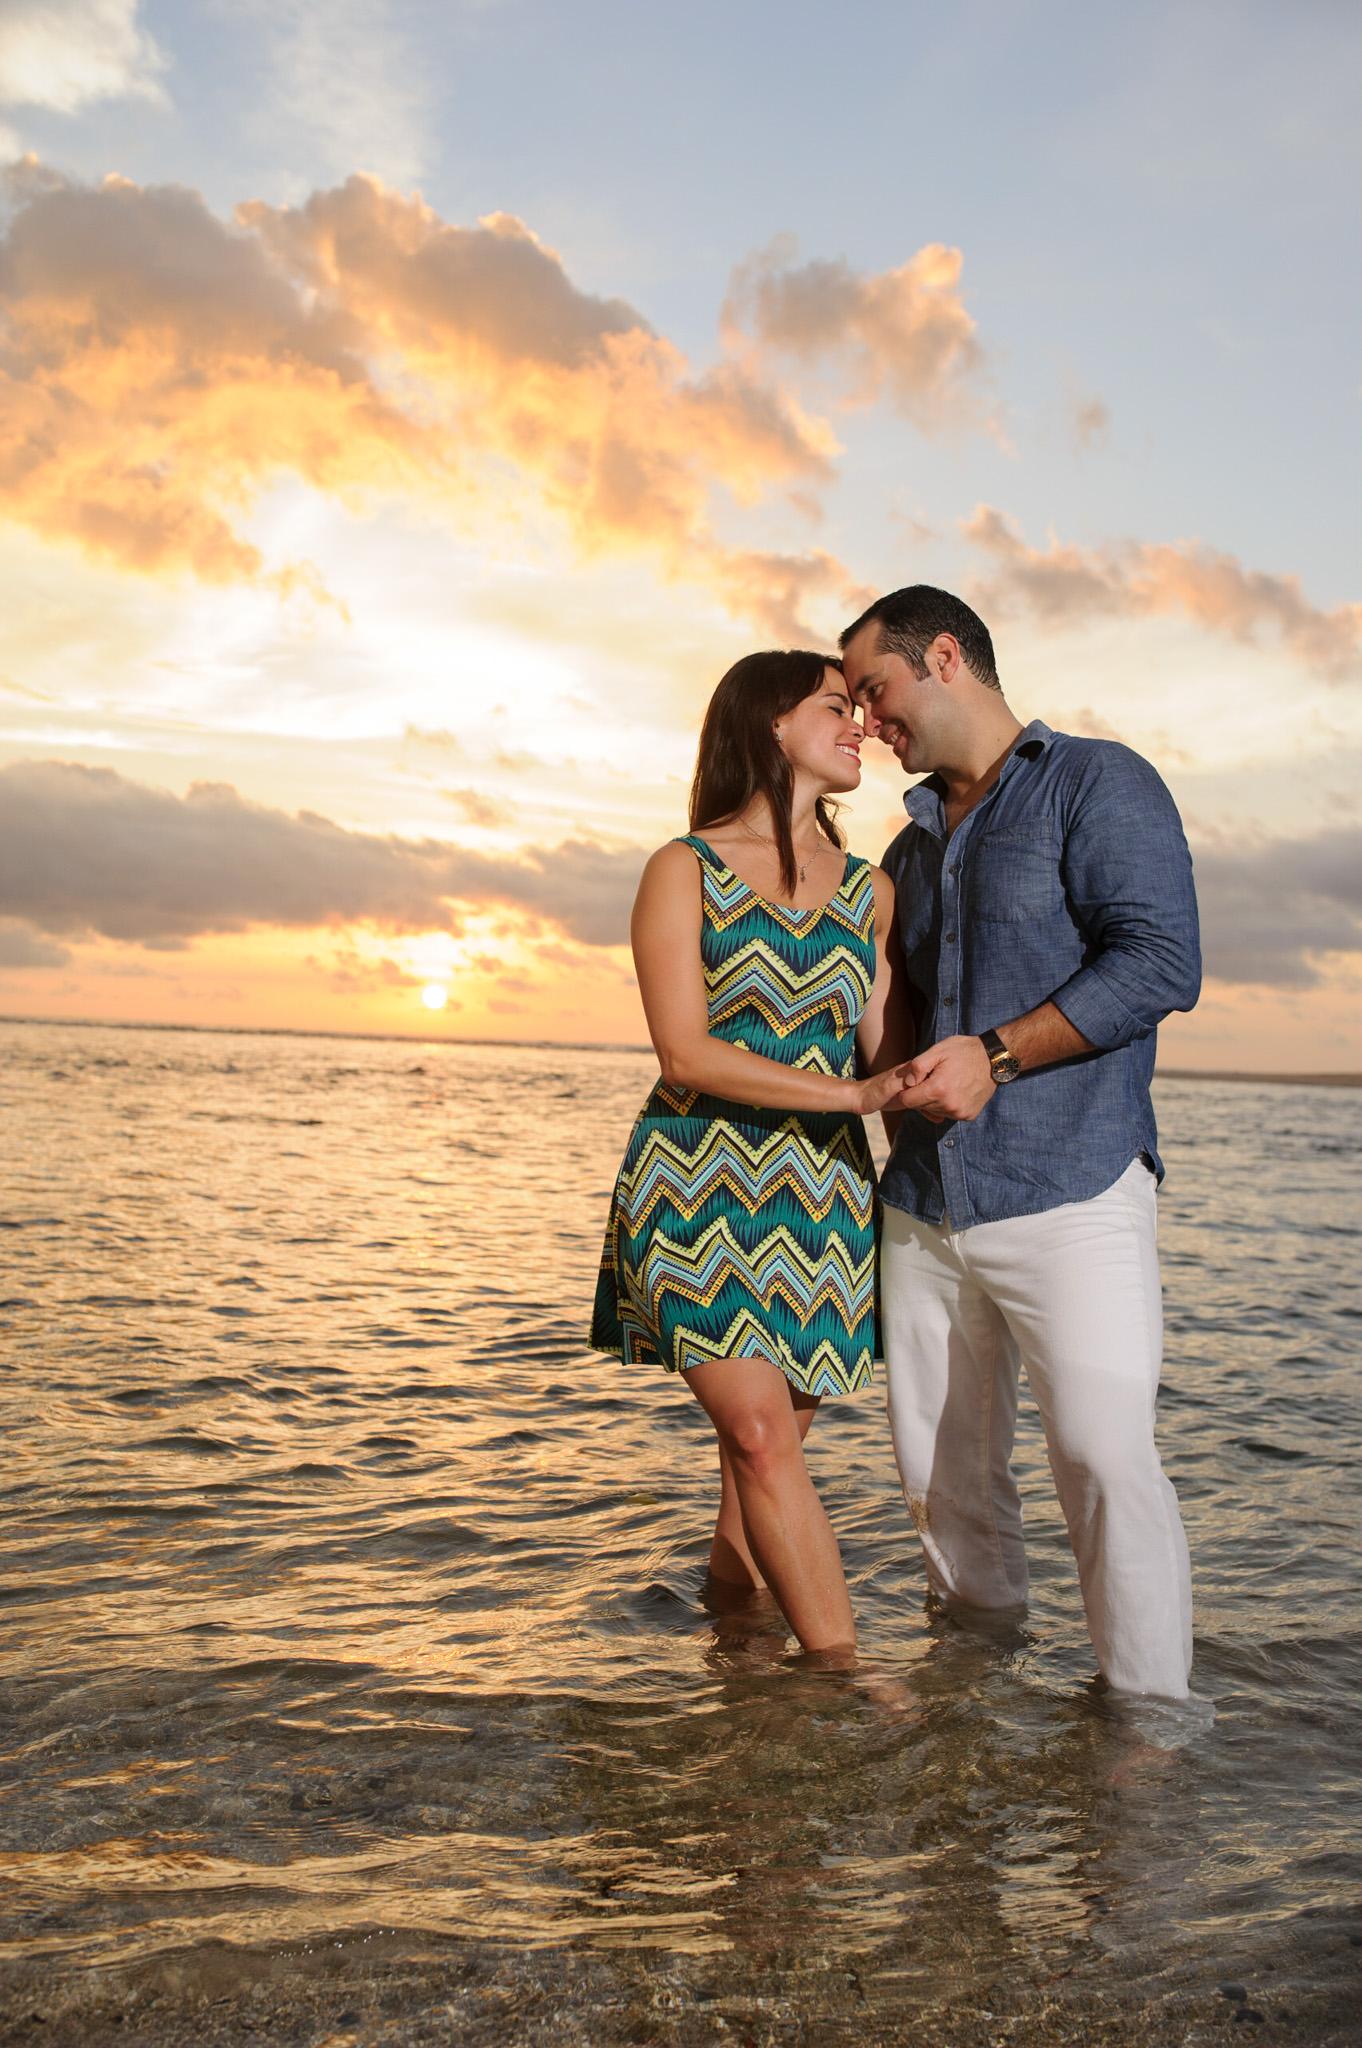 Engagement travel photos costa rica